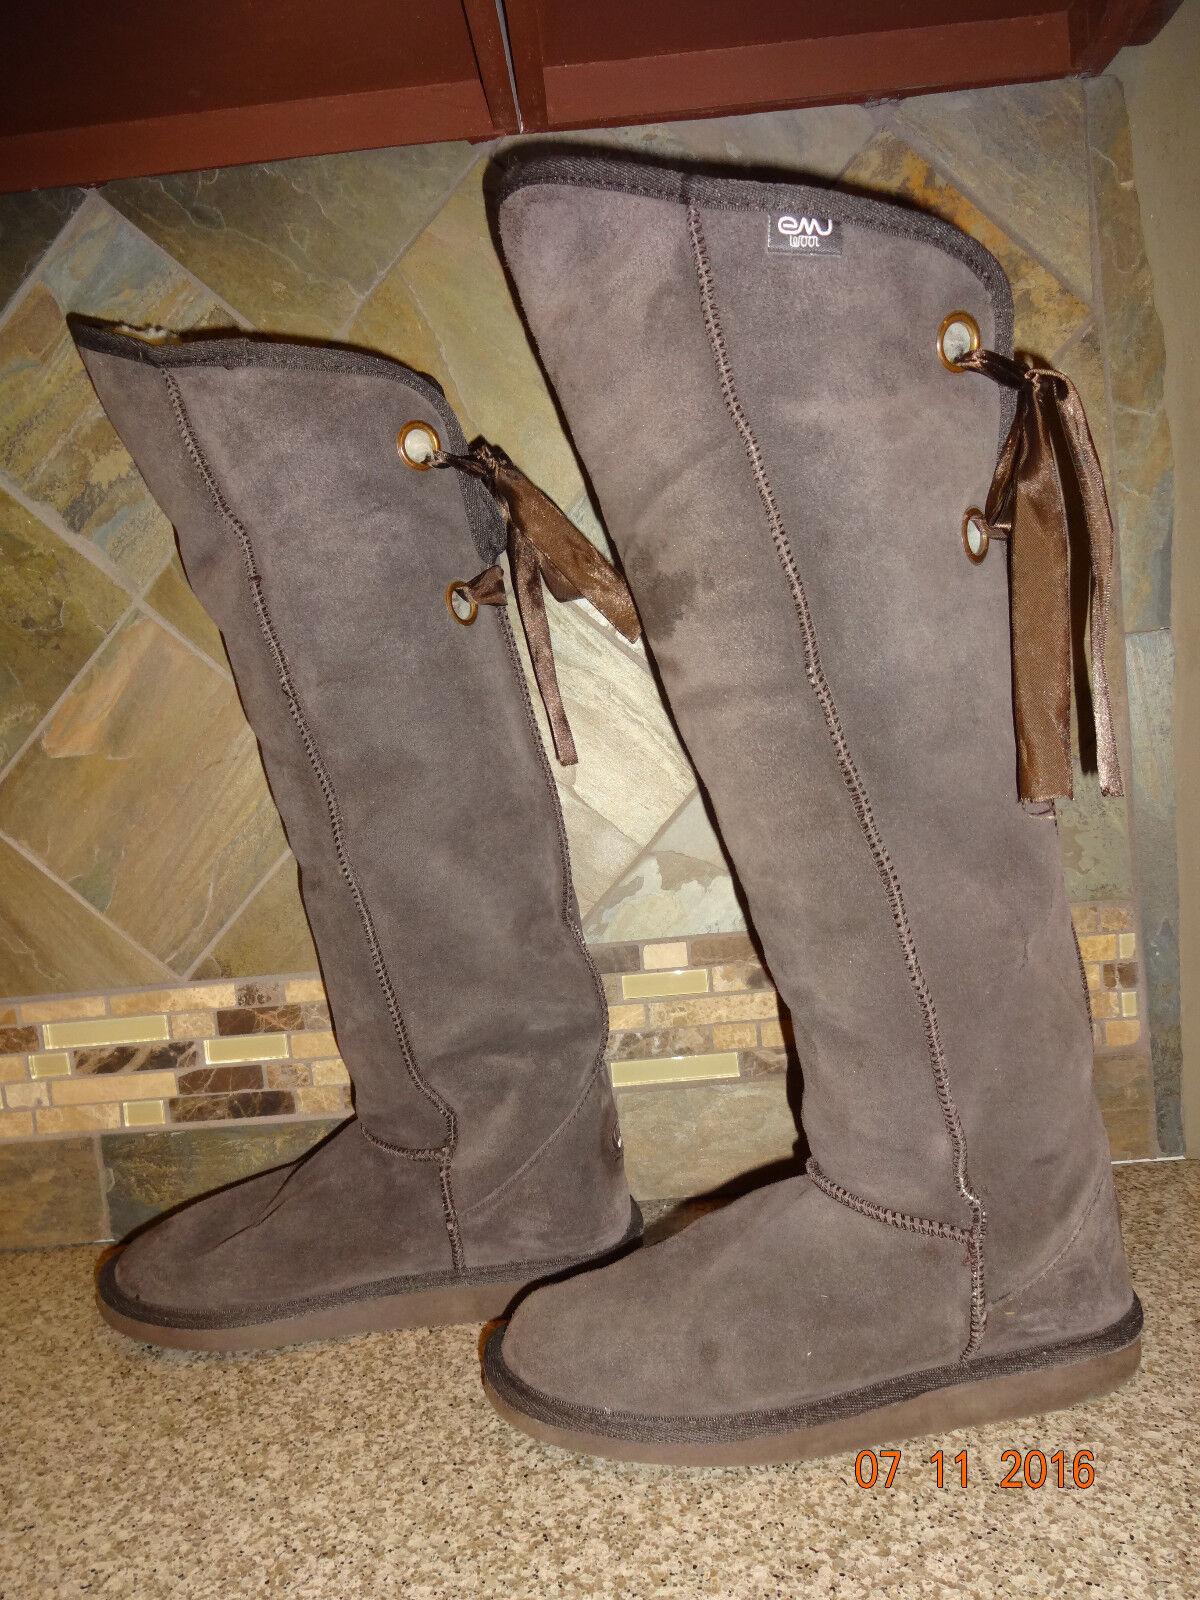 comodamente donna emu  Avoca  Sz Sz Sz 8 39 Merino Wool Lined 20.5  Tall Dark Marrone Suede stivali  vendita outlet